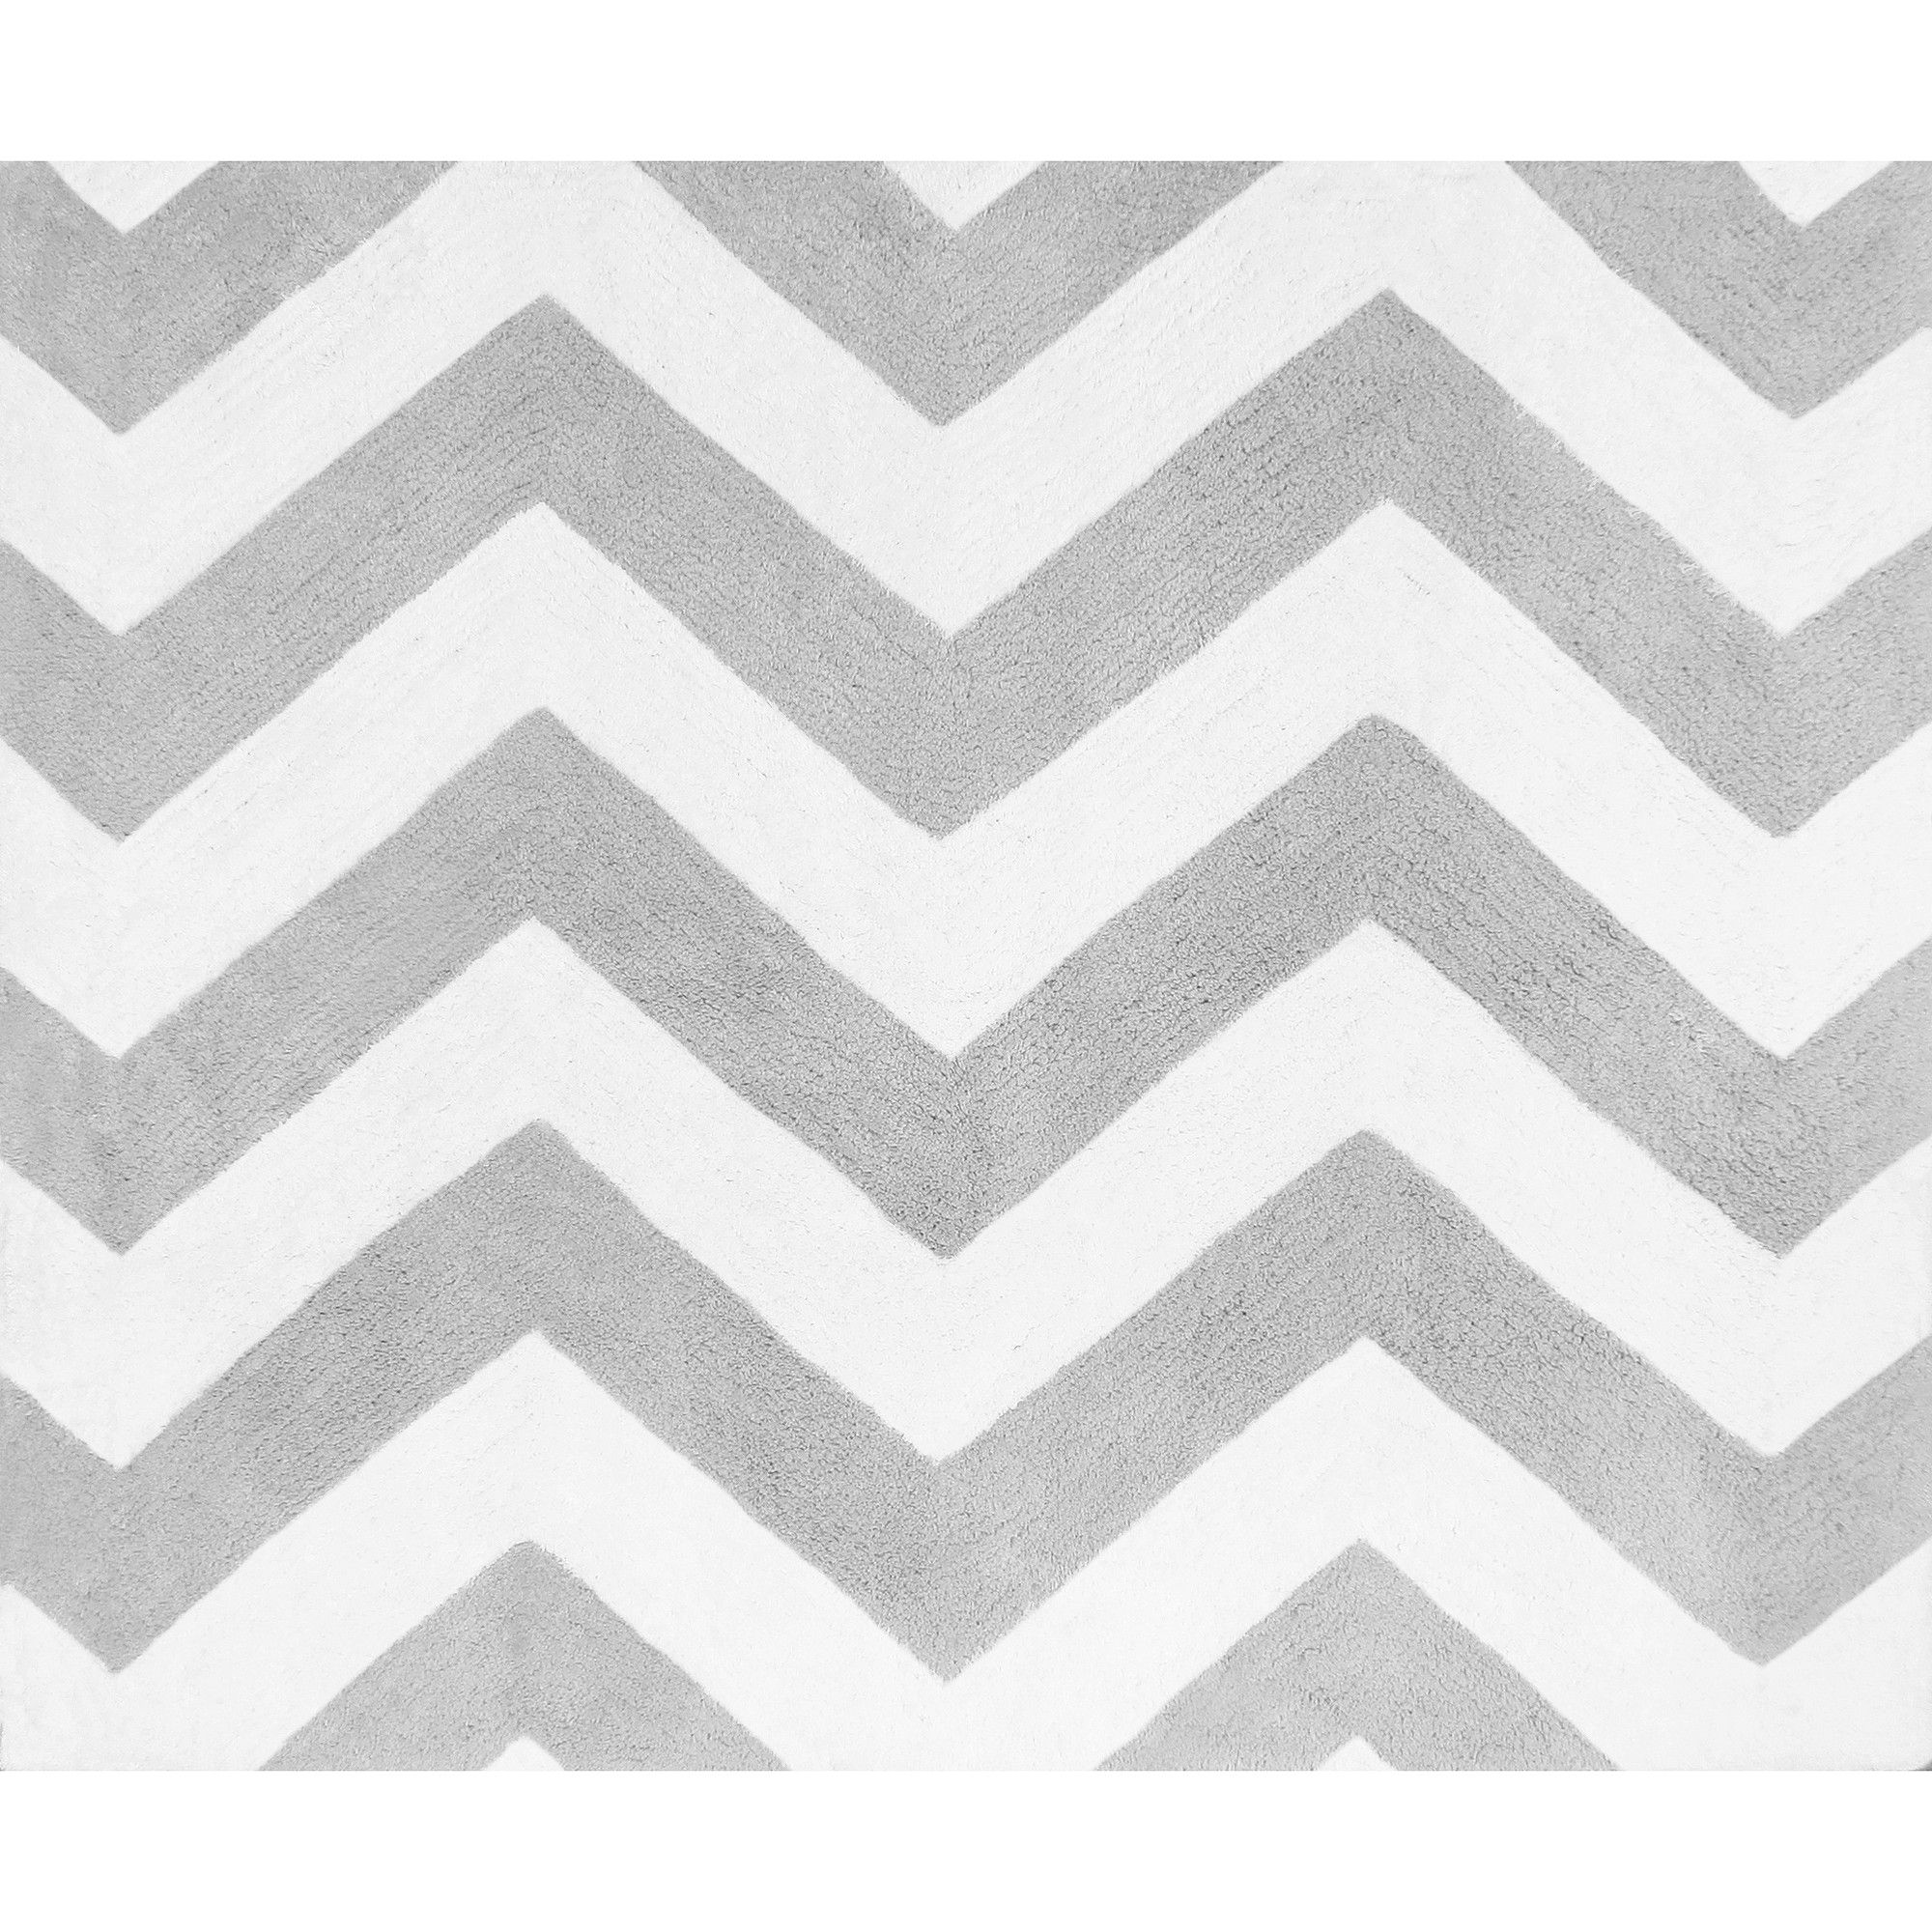 Sweet Jojo Designs Gray White Chevron Zigzag Floor Rug Rugs Grey